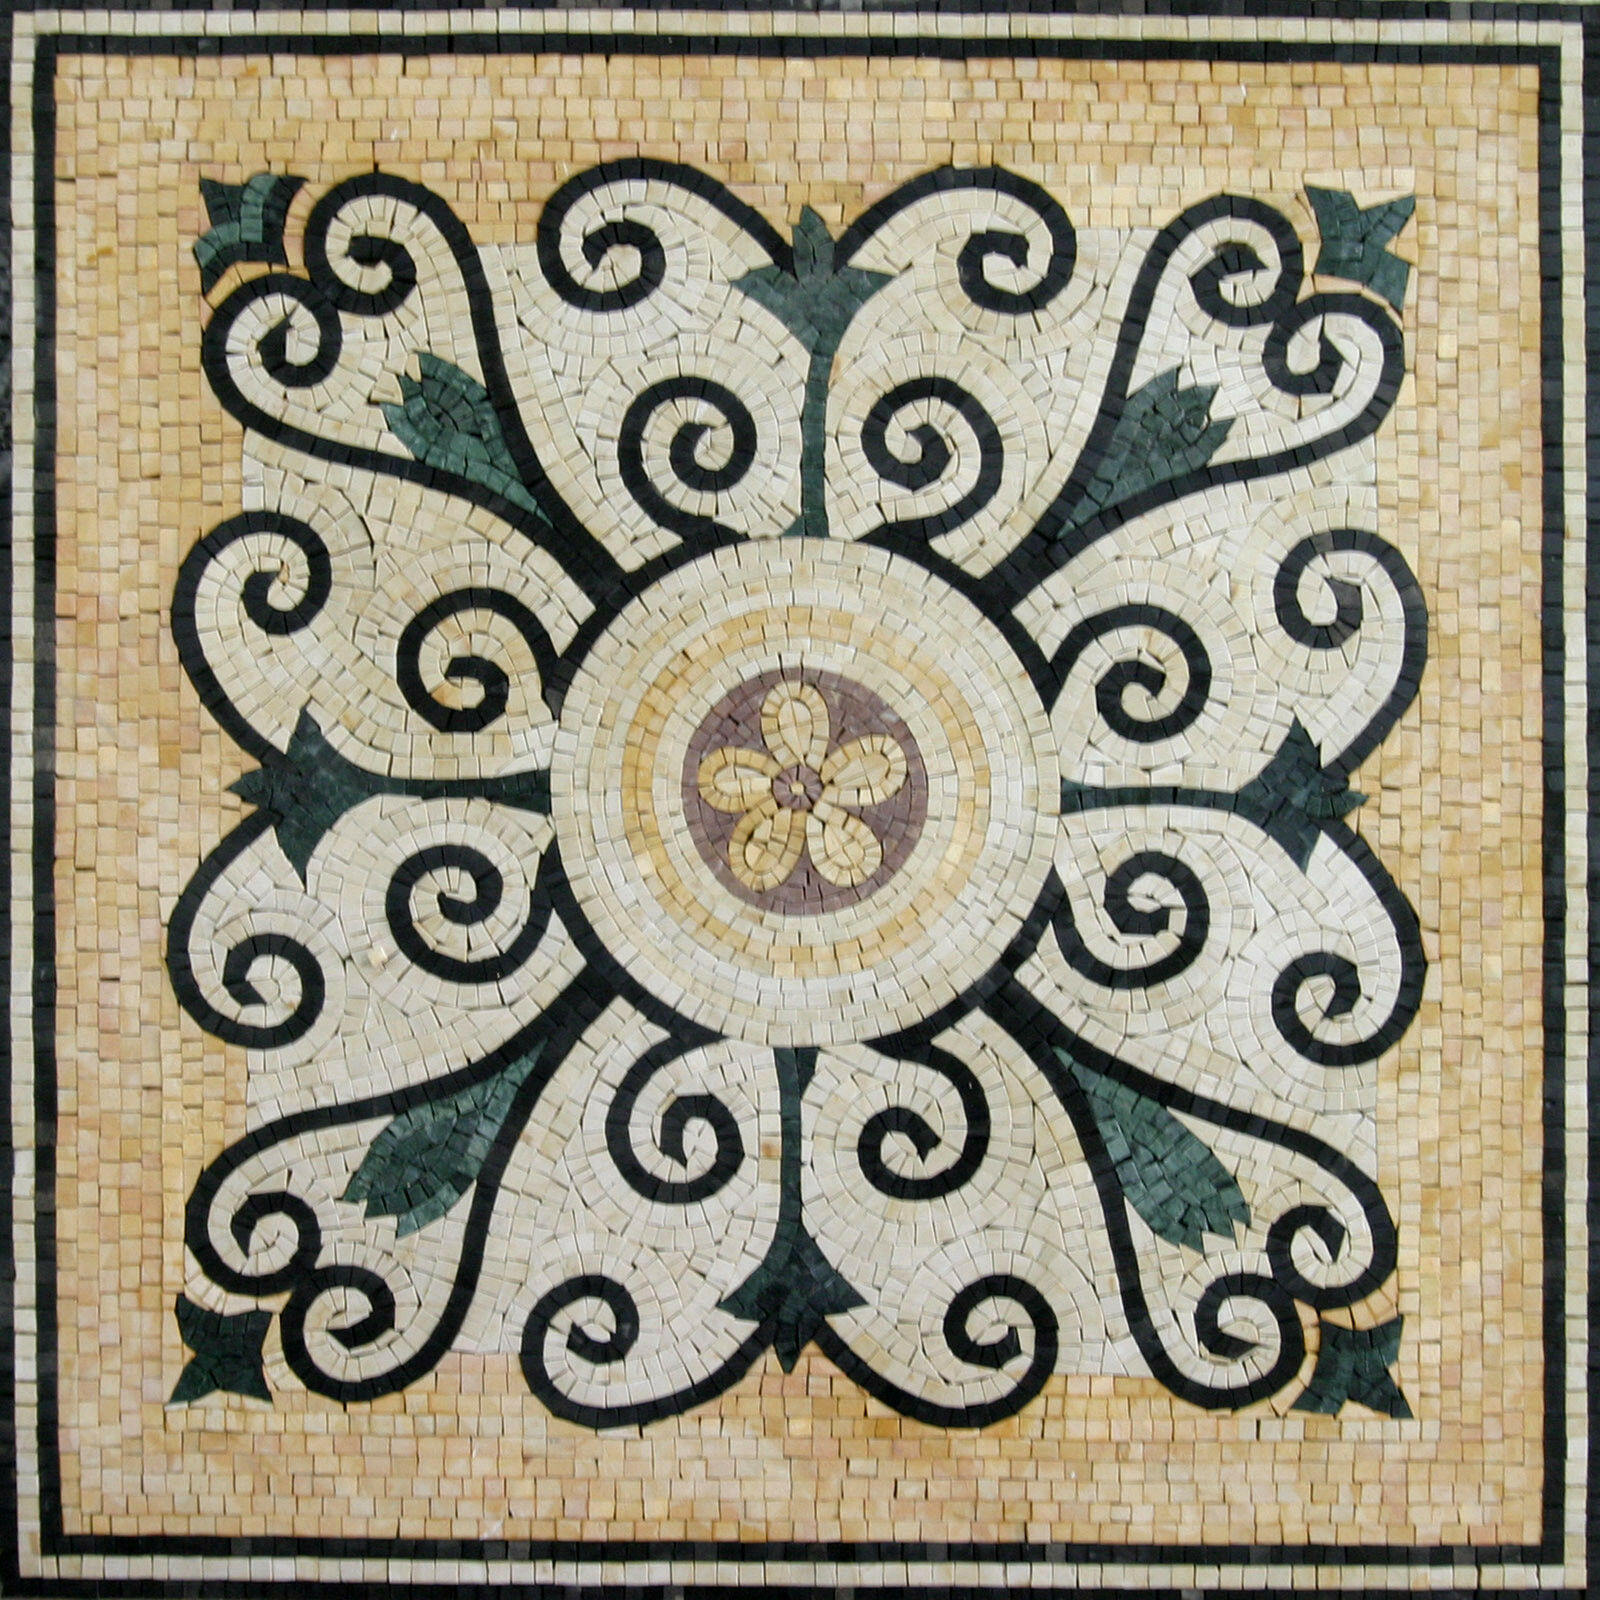 Archaic Greek Palace Tile Decor Floor Pool  Home Marble Mosaic GEO1445